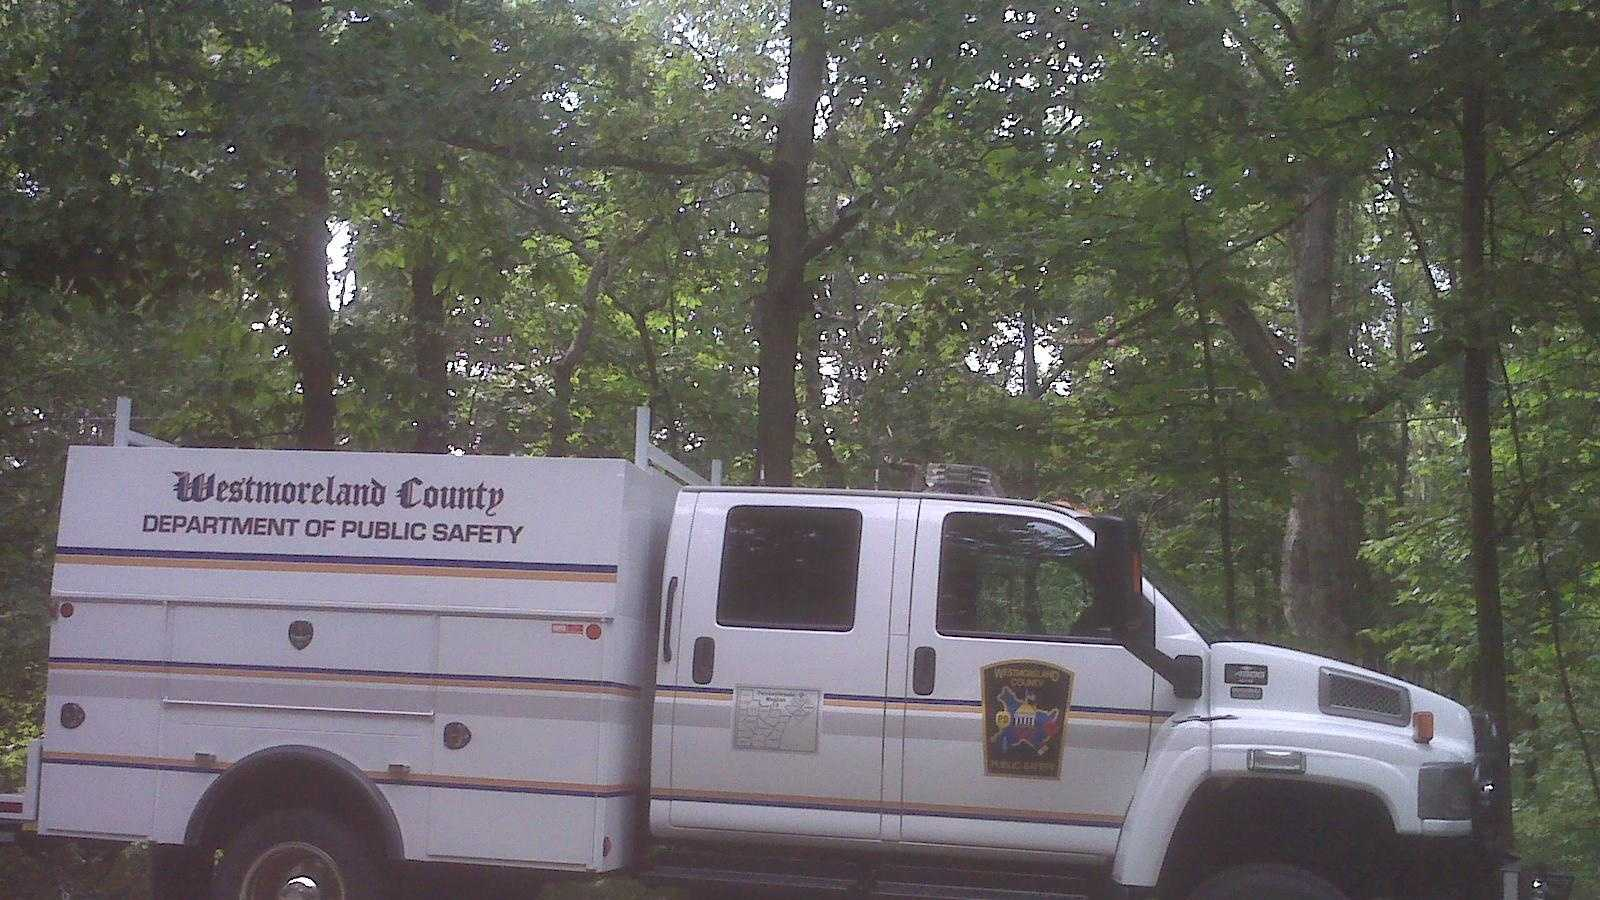 Westmoreland County coroner truck - 24228375